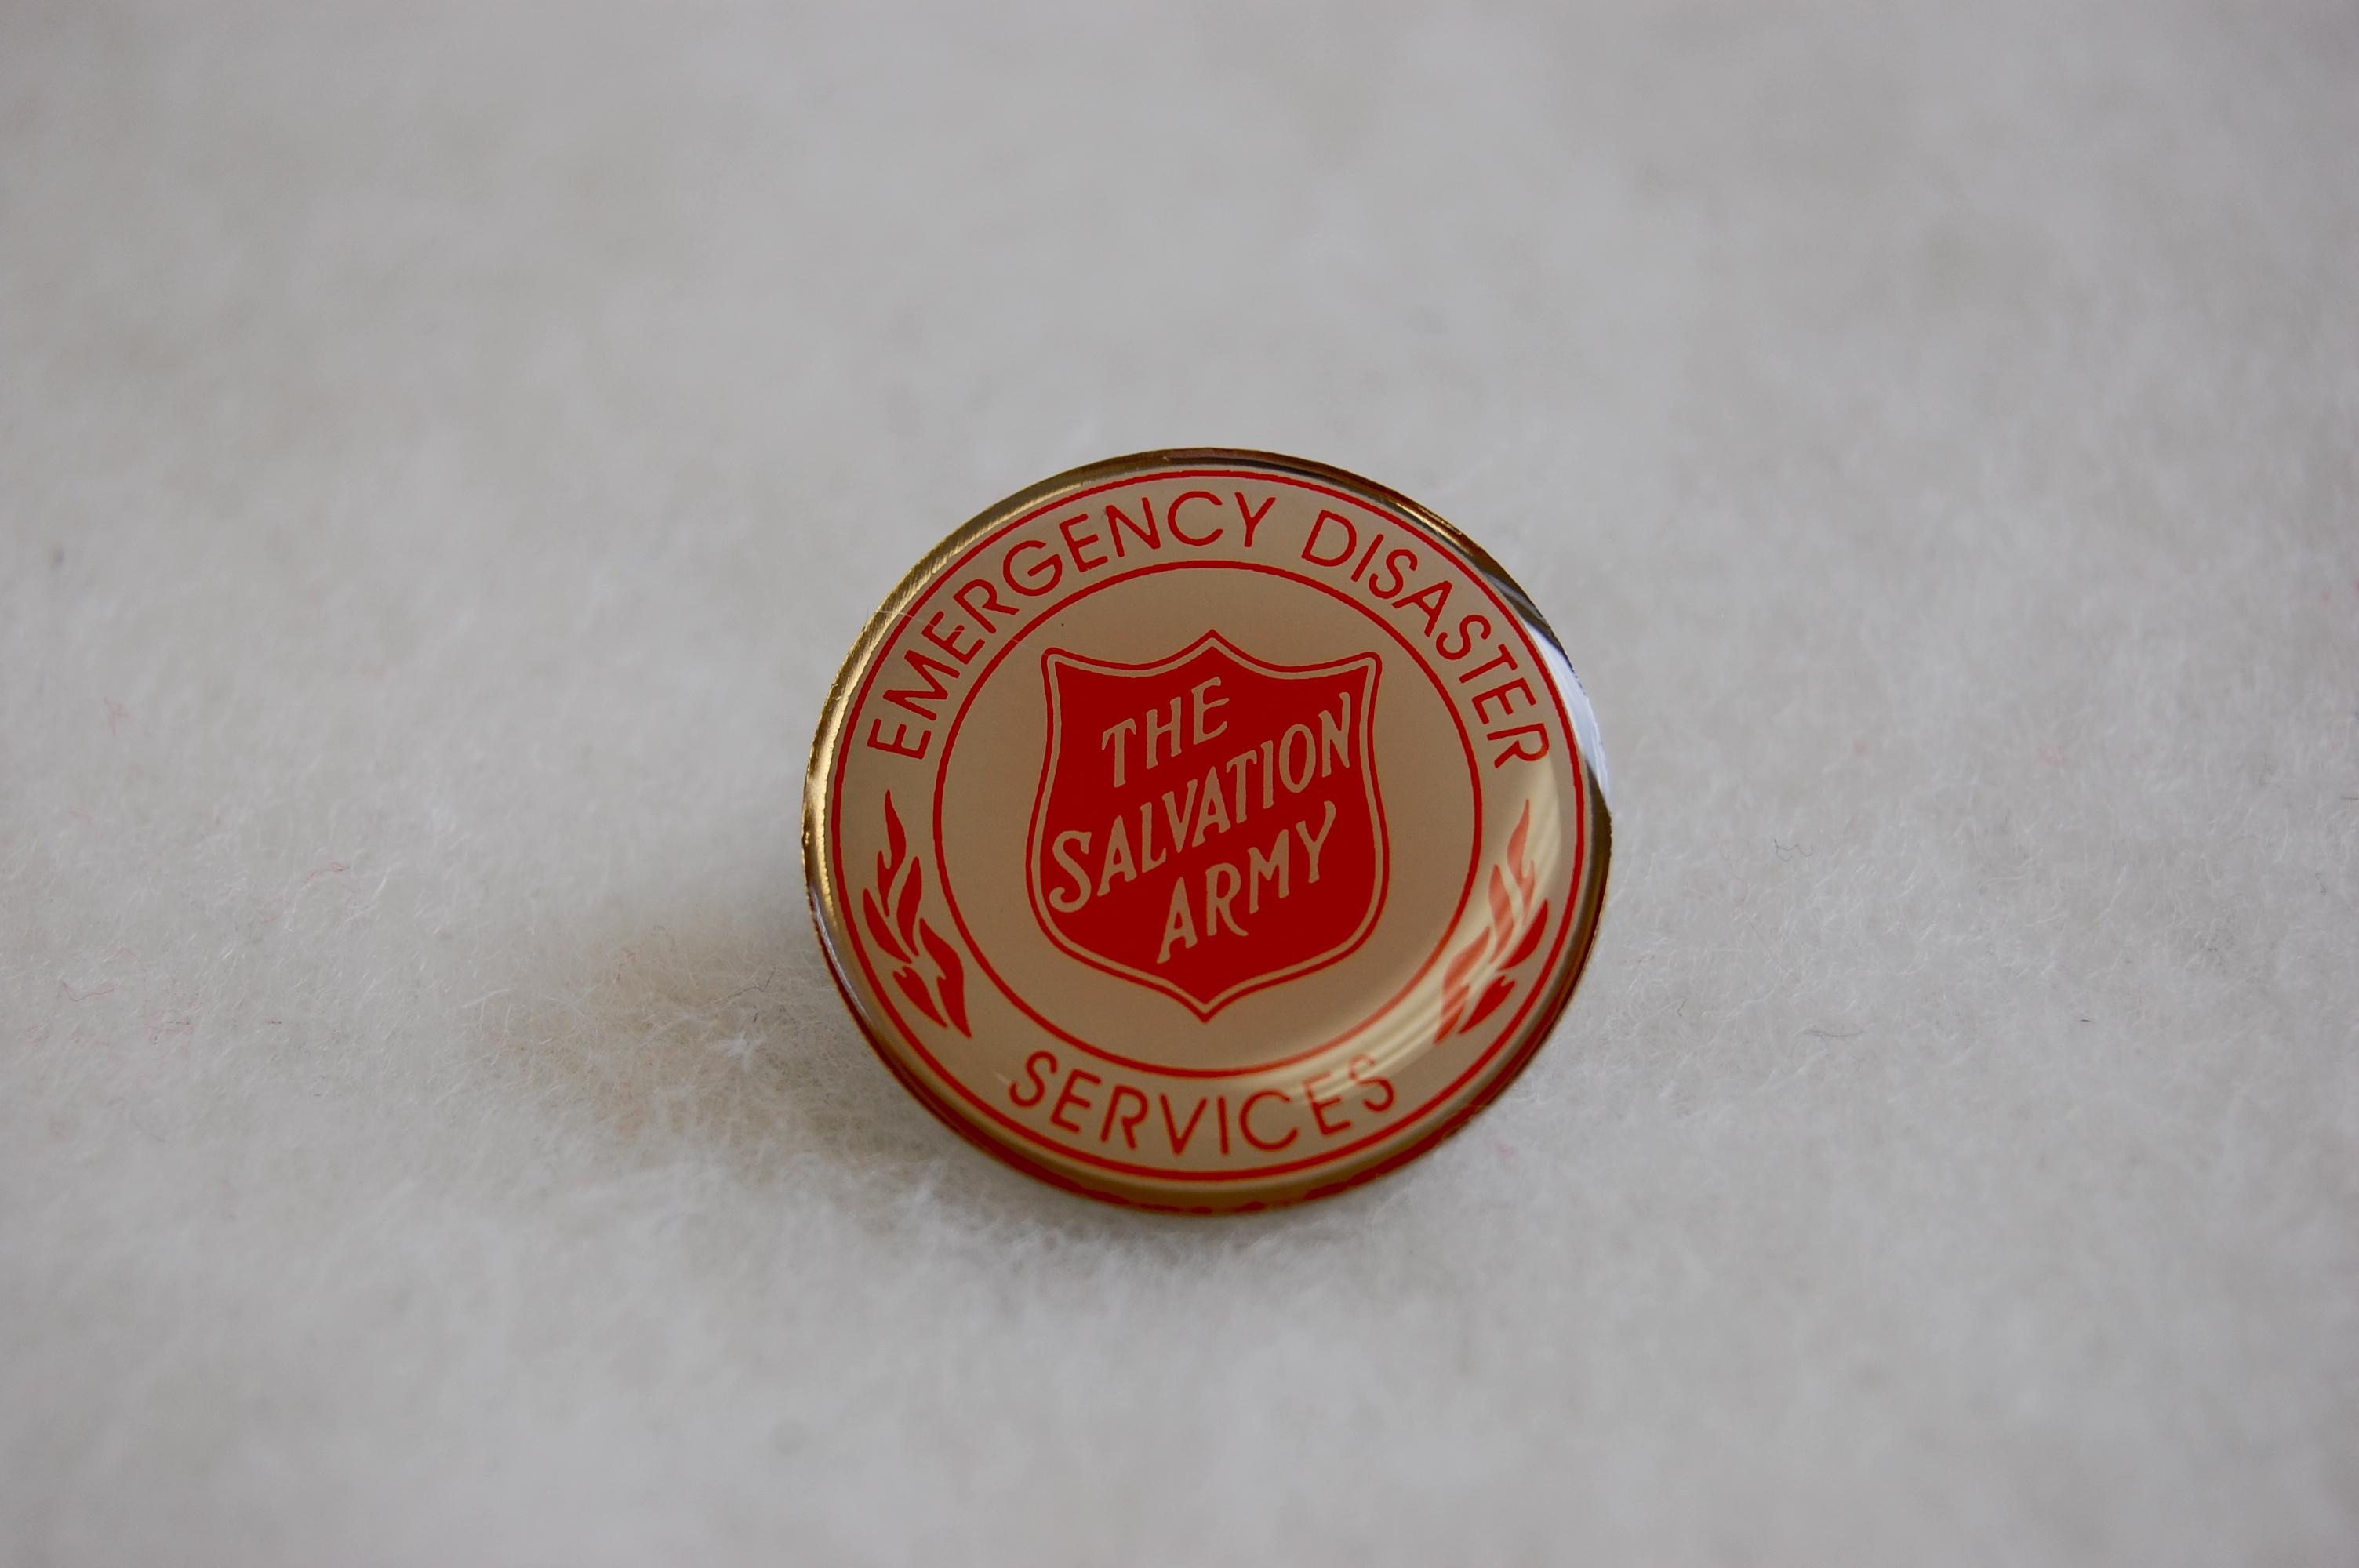 EDS Lapel Pin : Epoxy Enamel | The Salvation Army ...